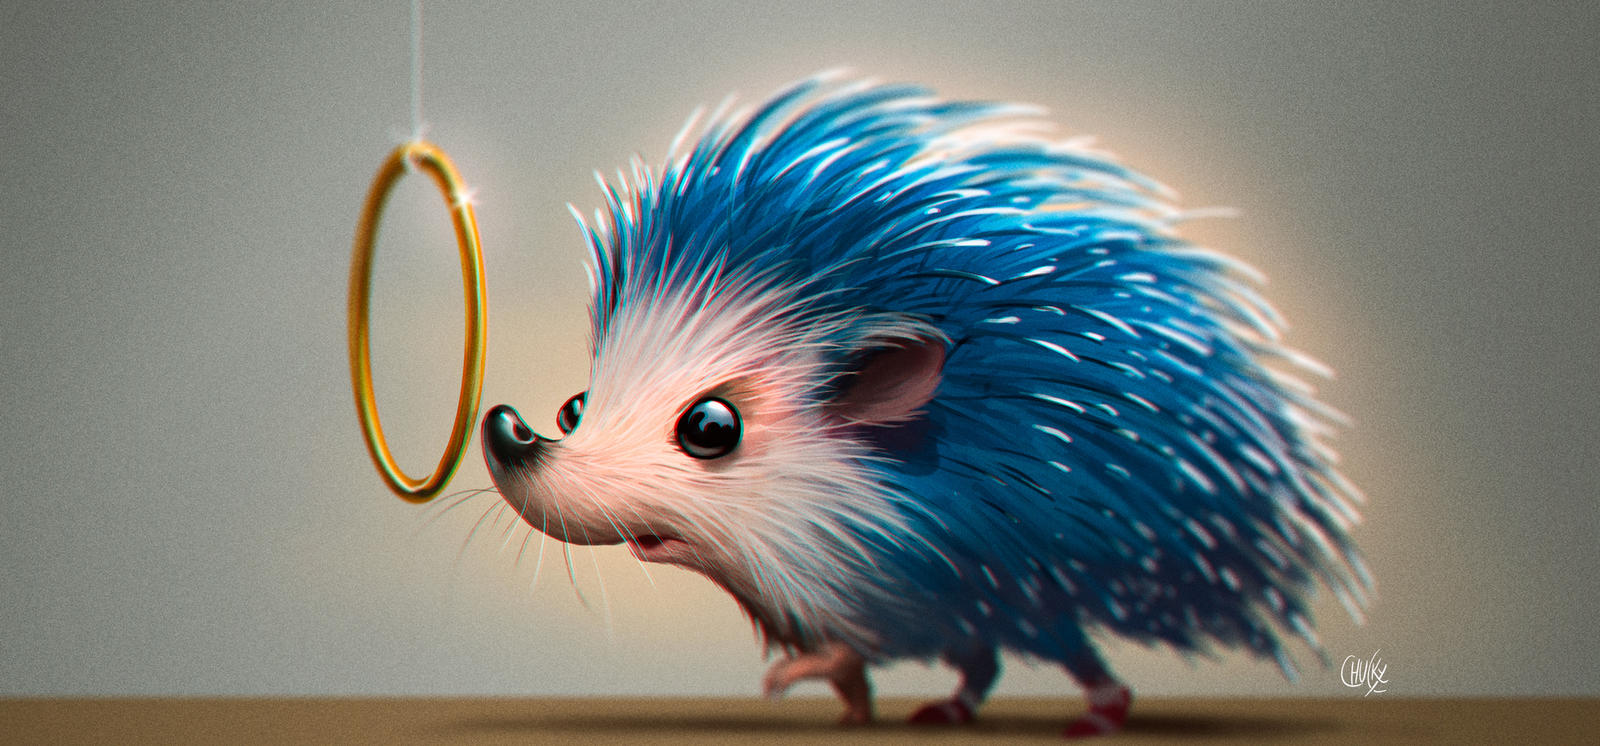 Sonic hedgehog by fubango